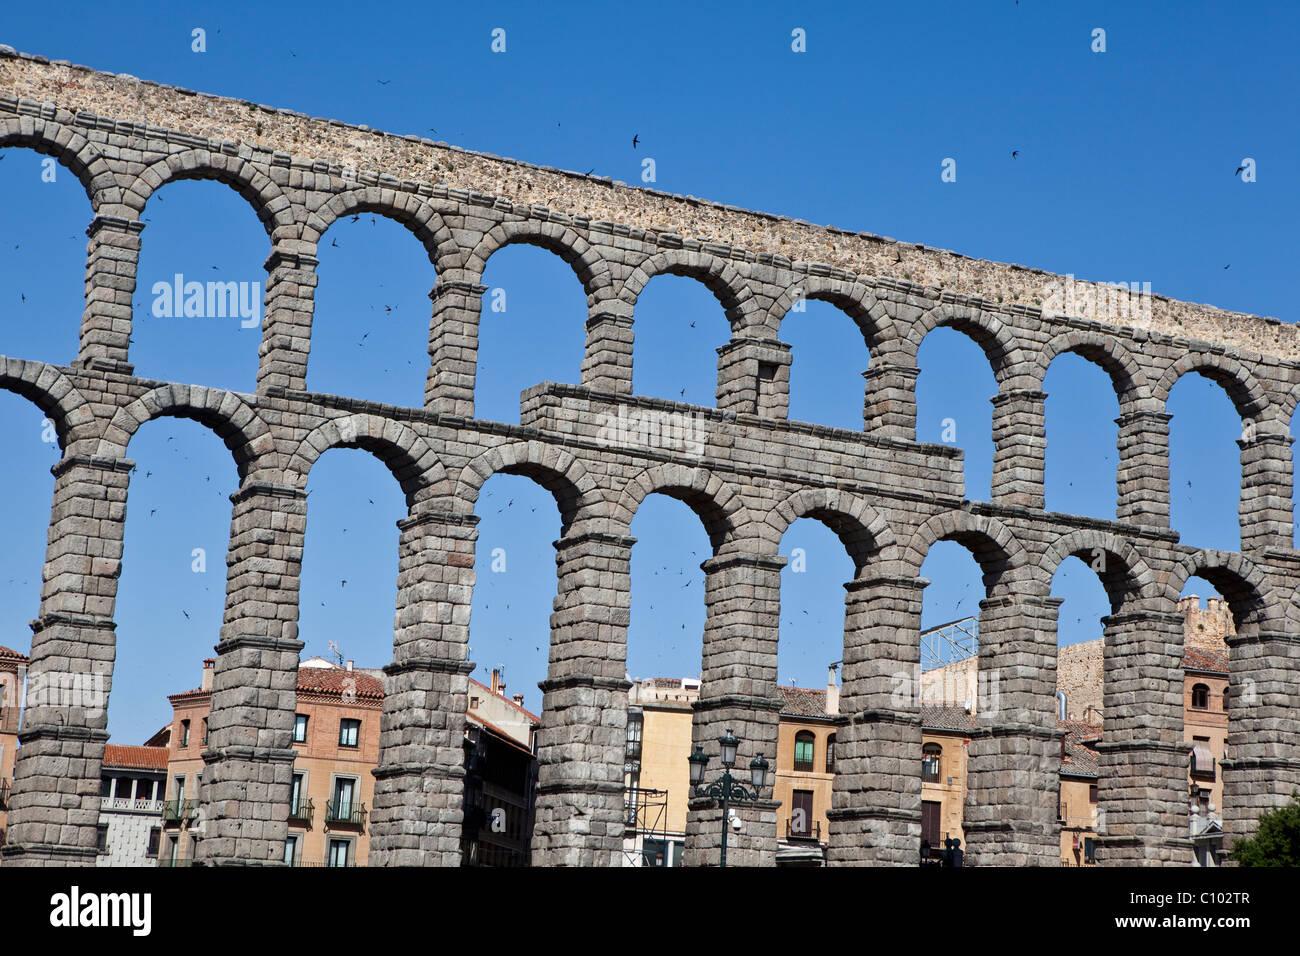 Roman aqueduct located at Plaza del Azoguejo of Segovia (Spain). Acueducto de Segovia (España). Stock Photo